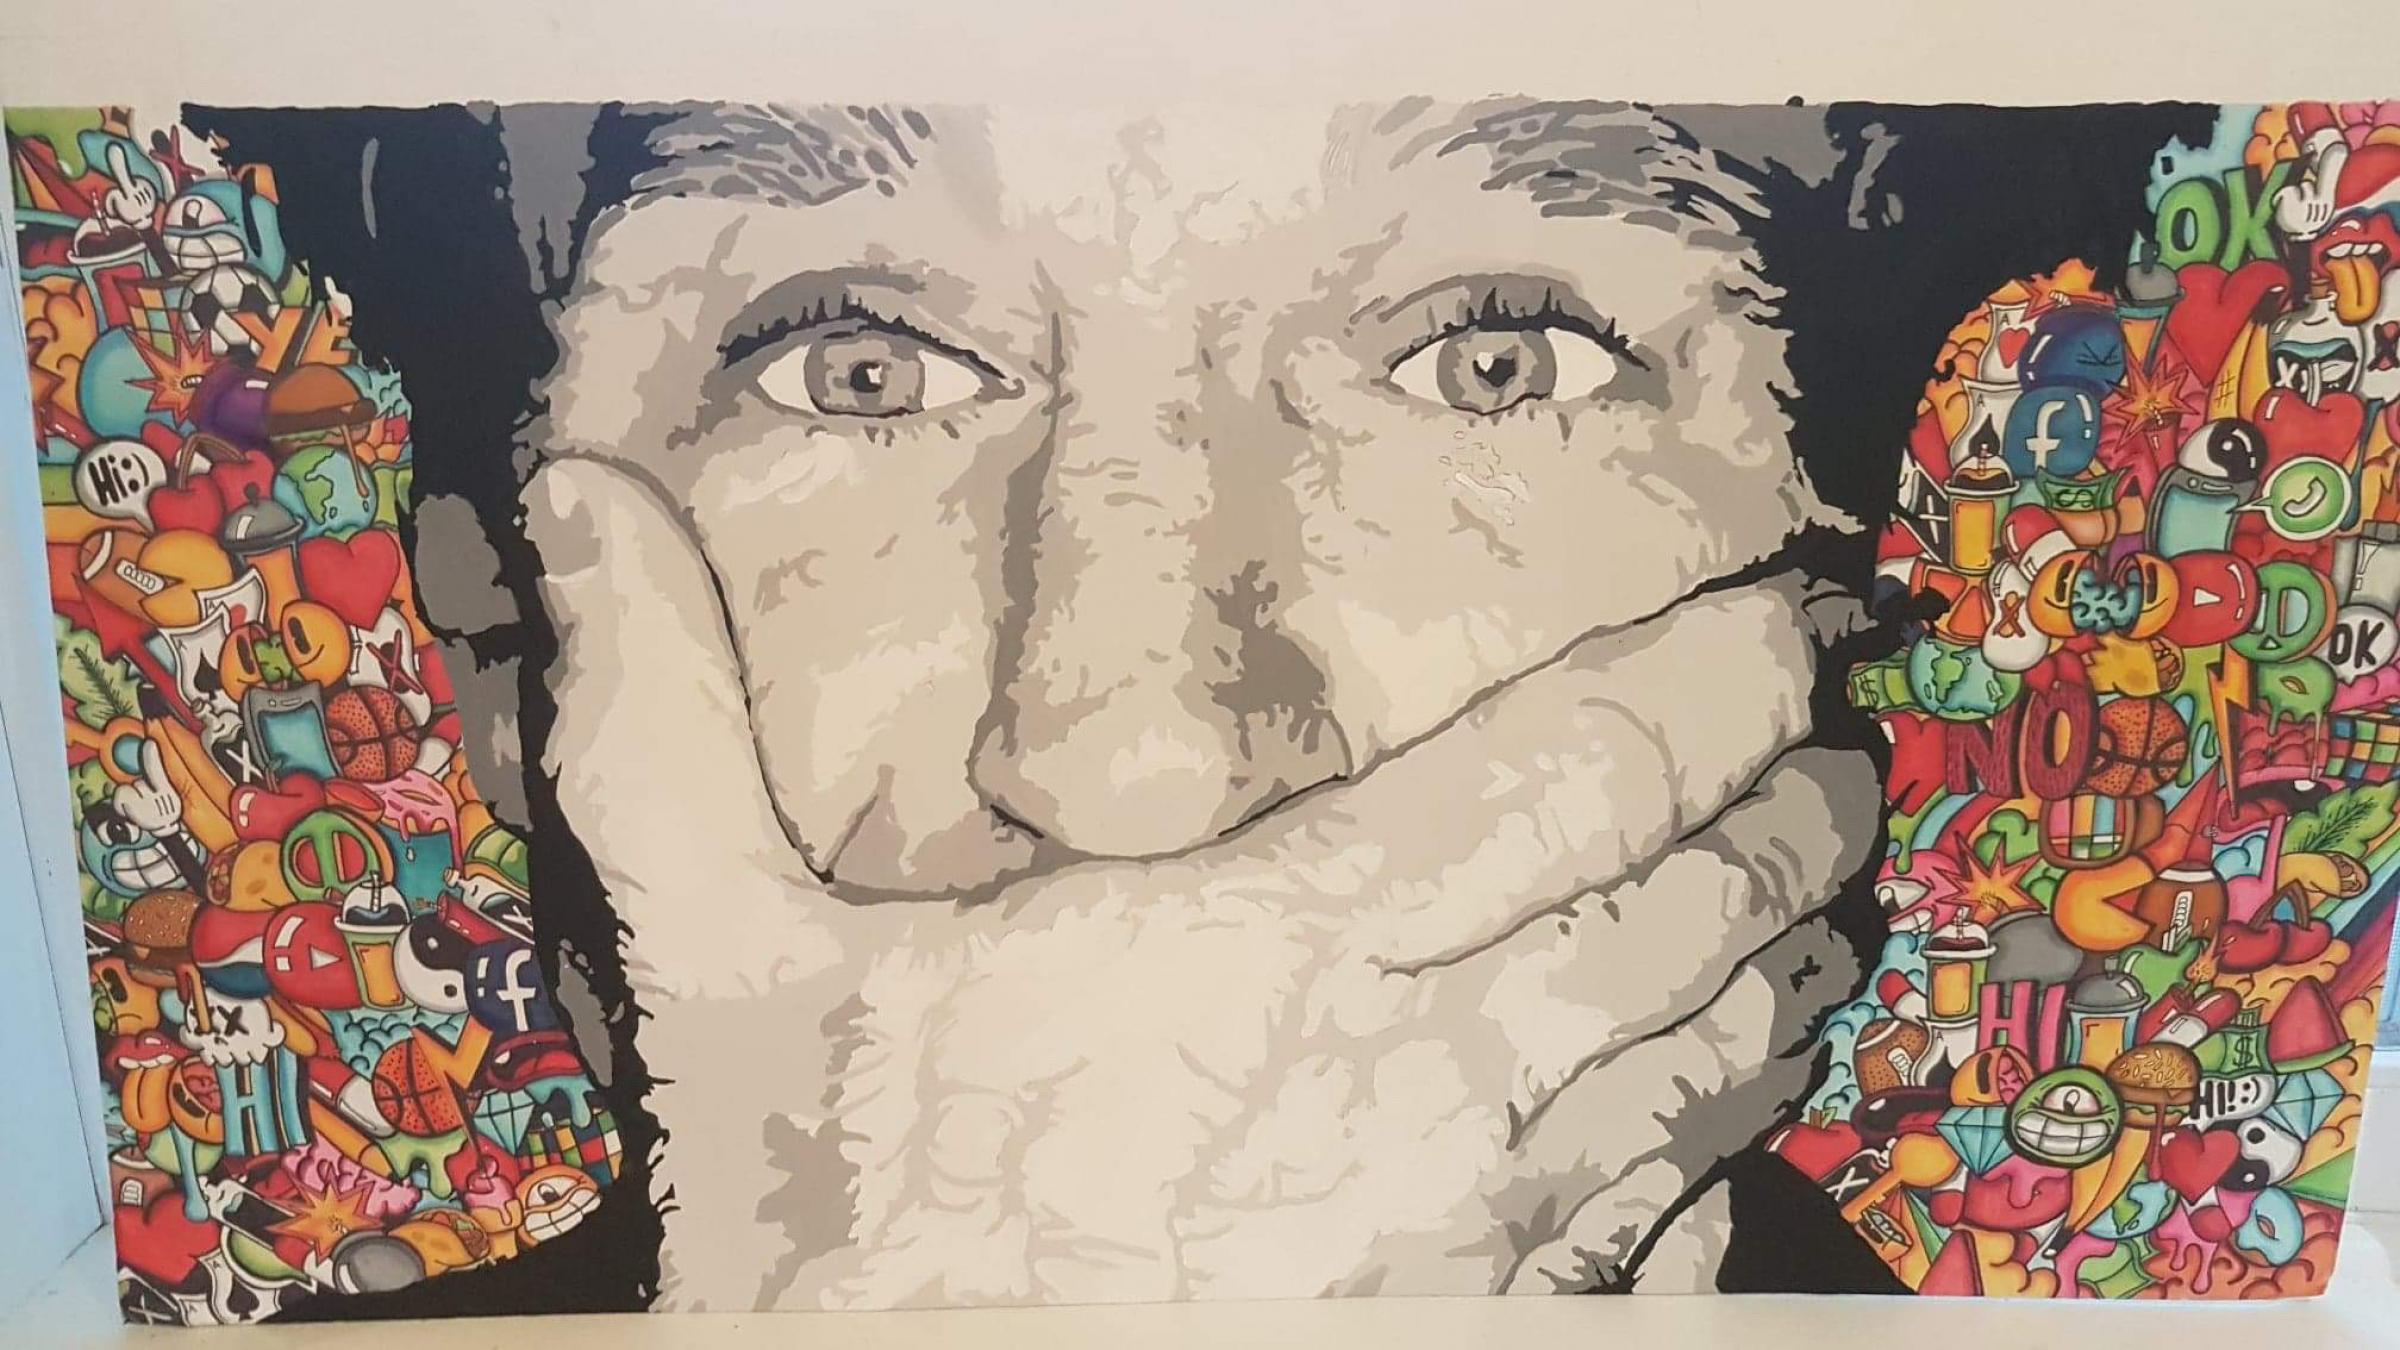 Unspoken by Liam Jackson-Hoag